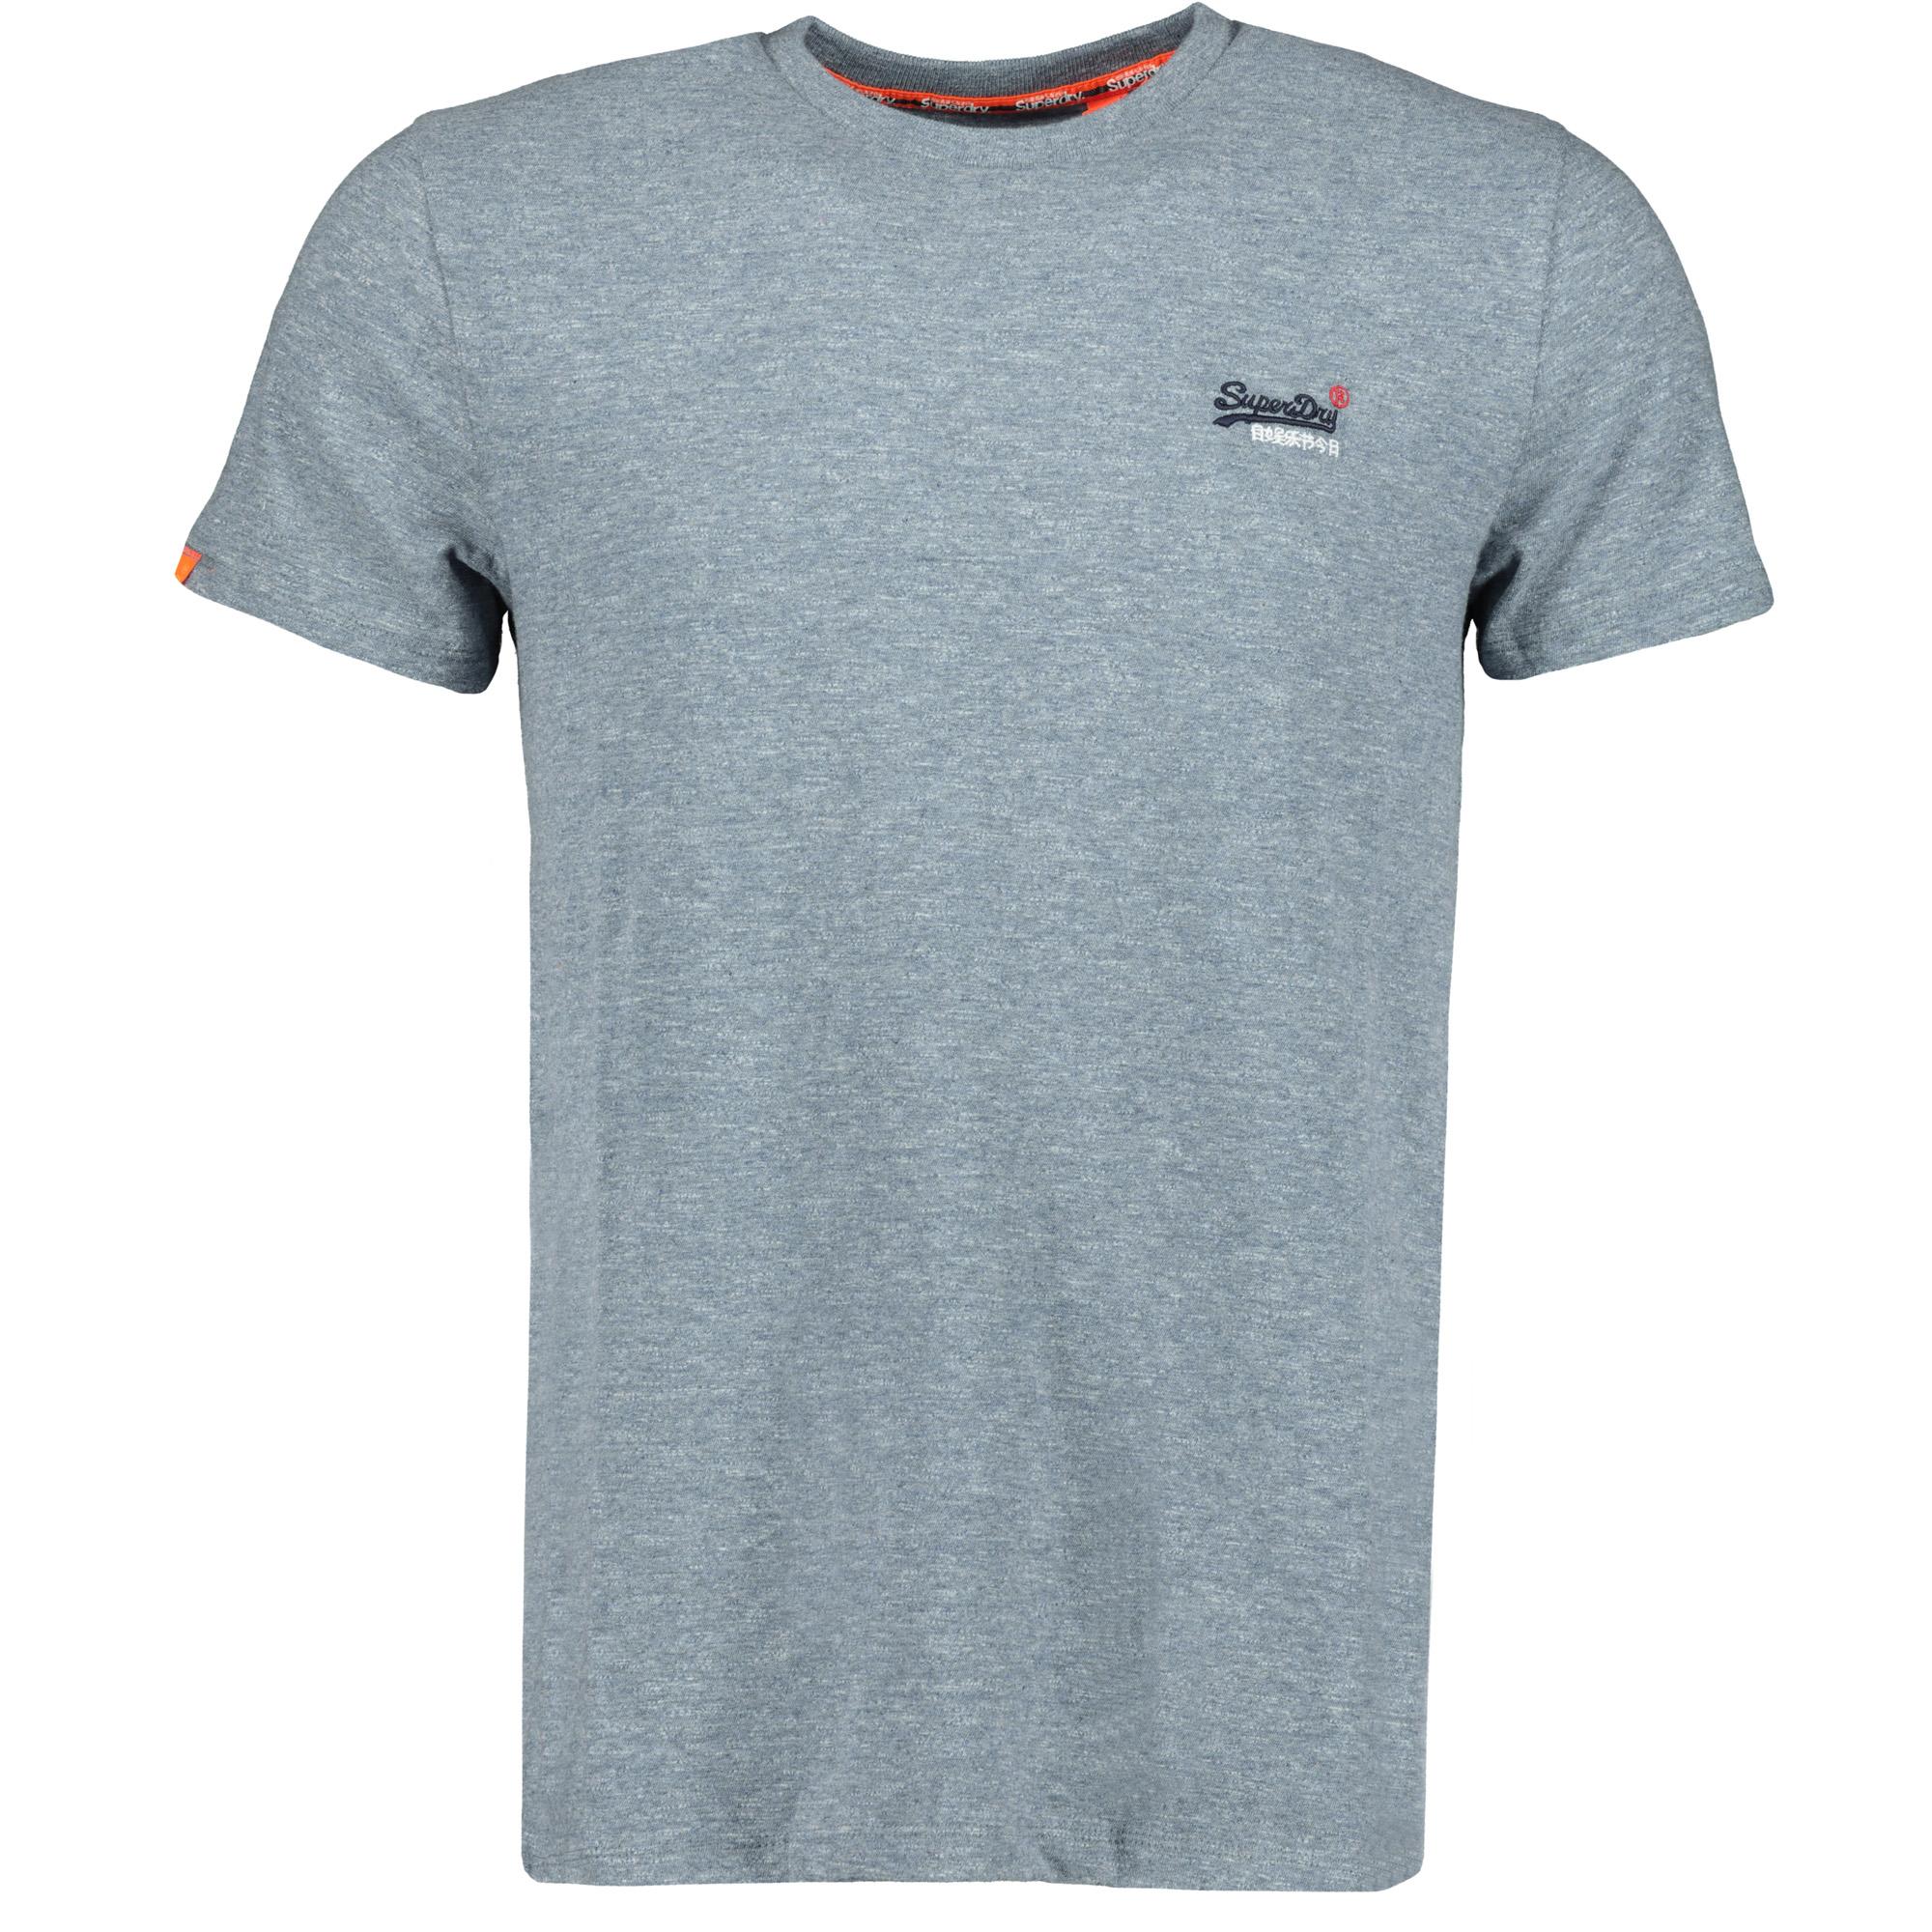 separation shoes ea7f3 50b17 Superdry OL Vintage Embroidery Tee Herren Freizeit T-Shirt creek blue grit  grindle Men Shirts T-Shirts